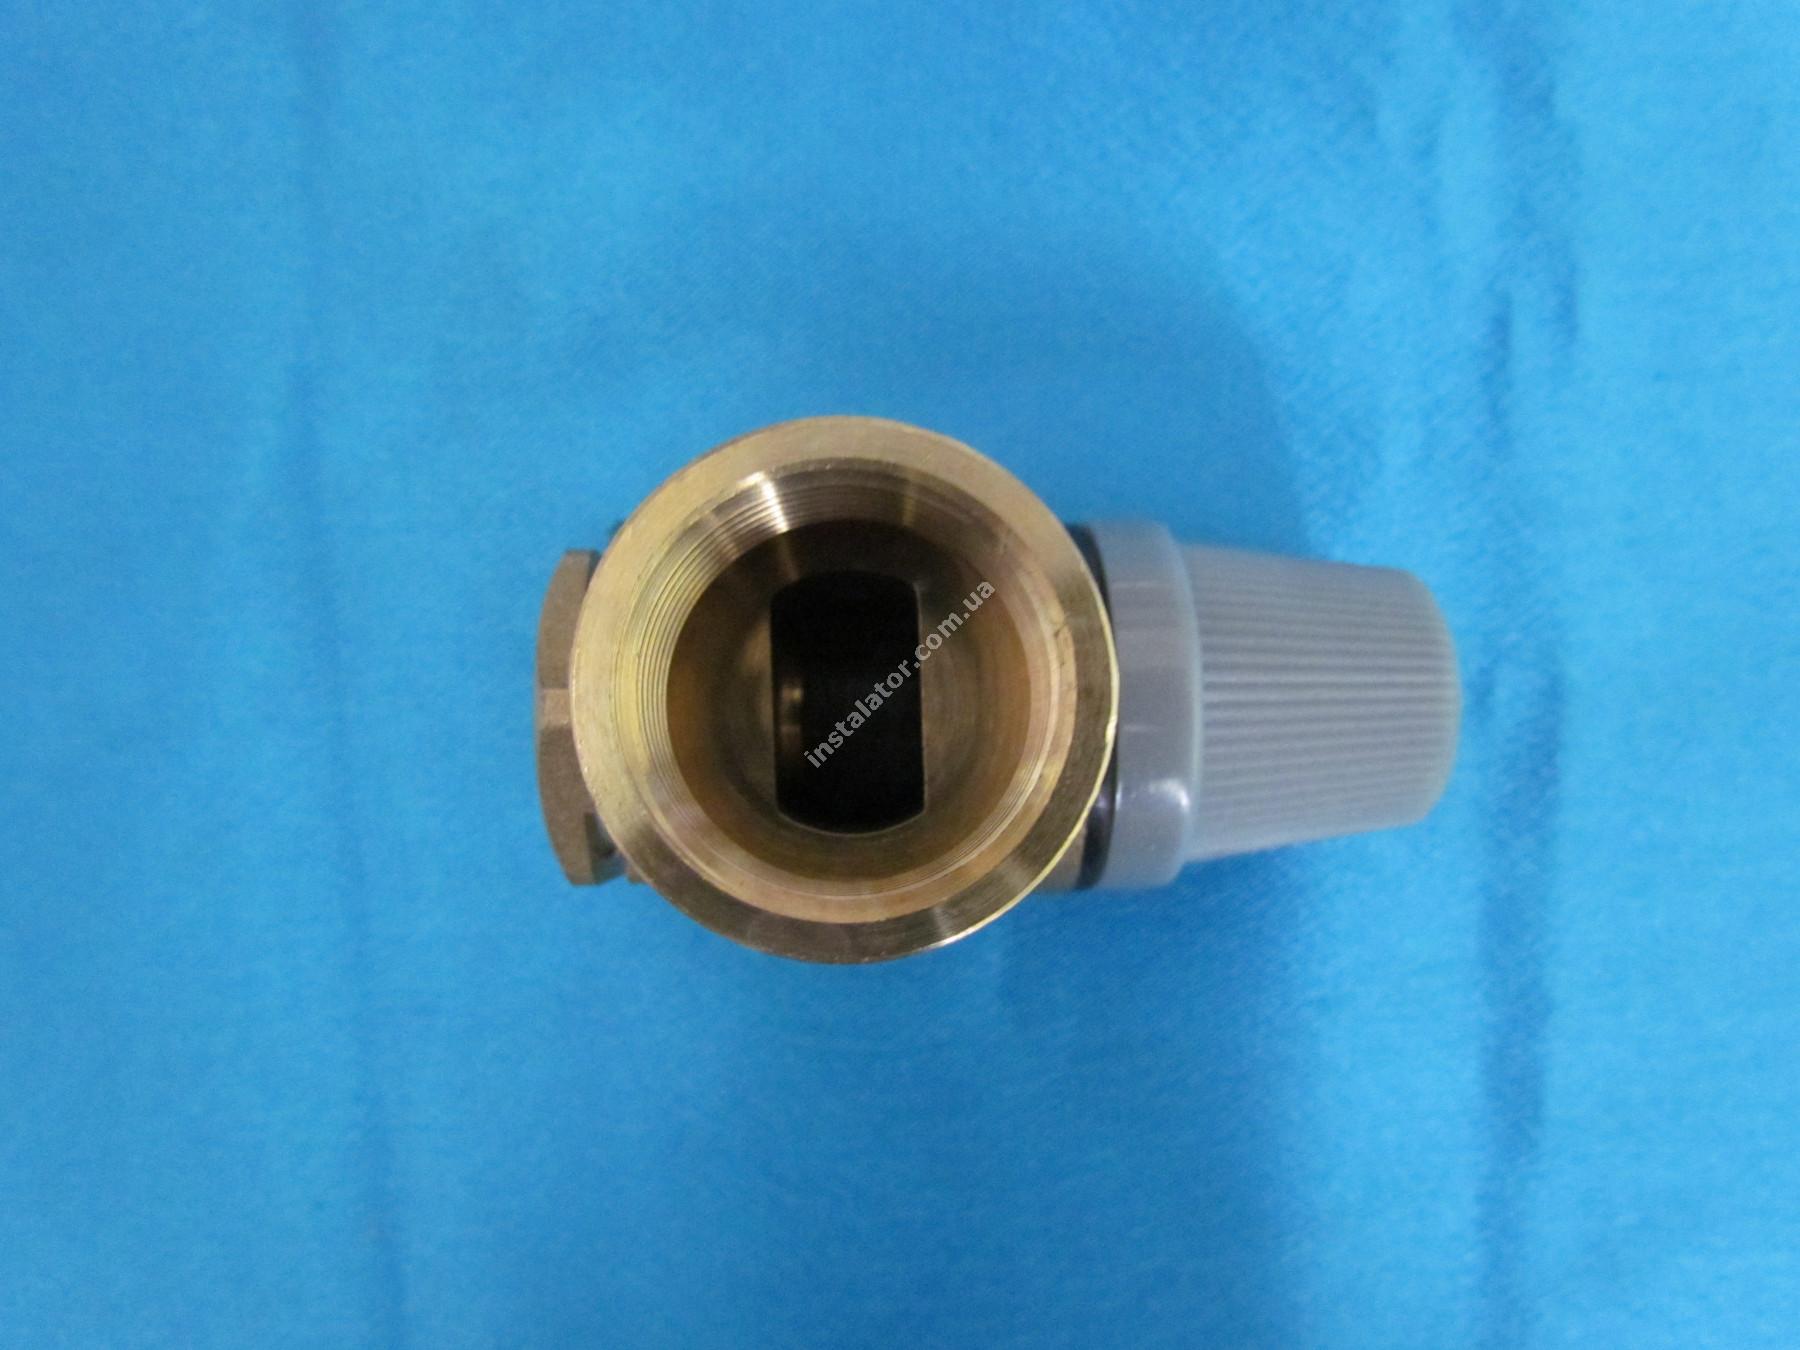 190732 (аналог) Запобіжний клапан  VAILLANT Pro/Plus 3 bar full-image-0